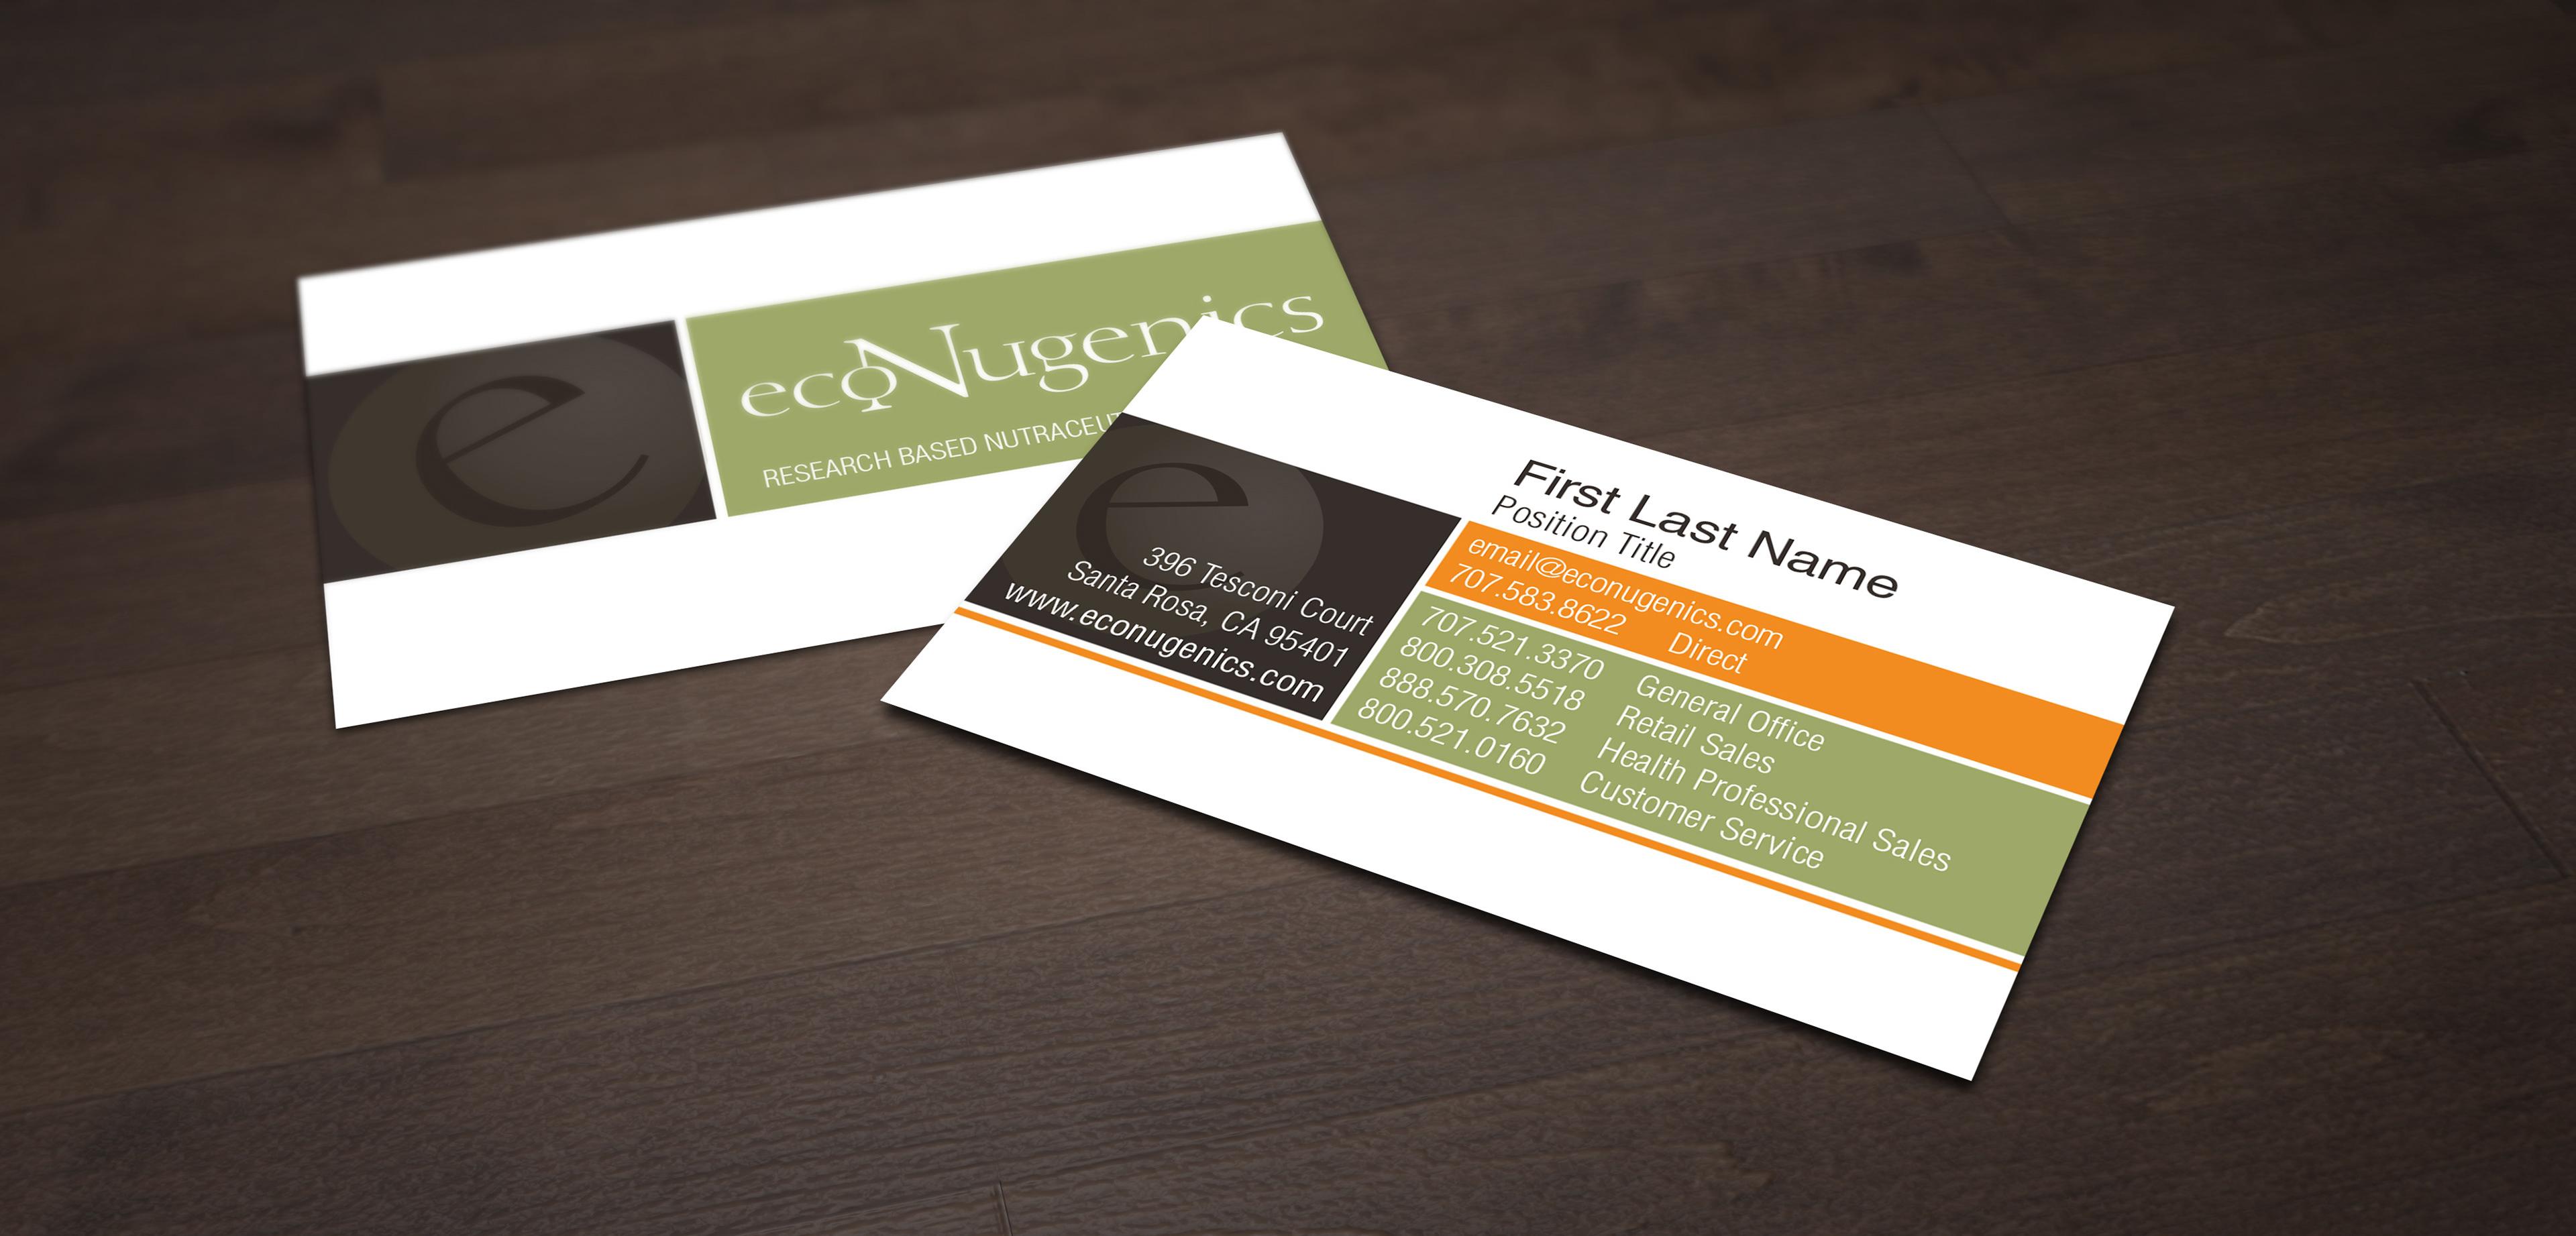 Rod Encarnacion - ecoNugenics - Business Card Re-Design